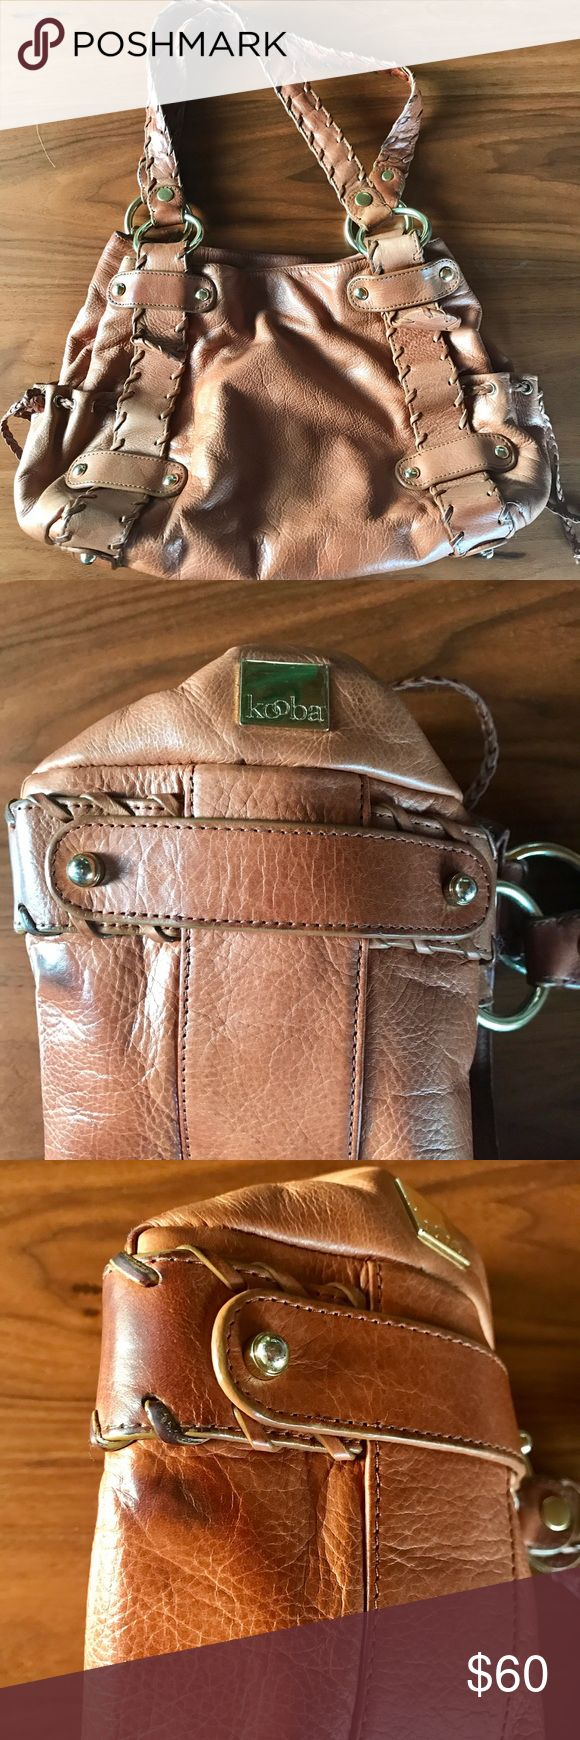 Kooba Sienna Pebbled Leather Kooba Sienna in Pebbled Leather with original dust bag - slight wear and tear Kooba Bags Shoulder Bags